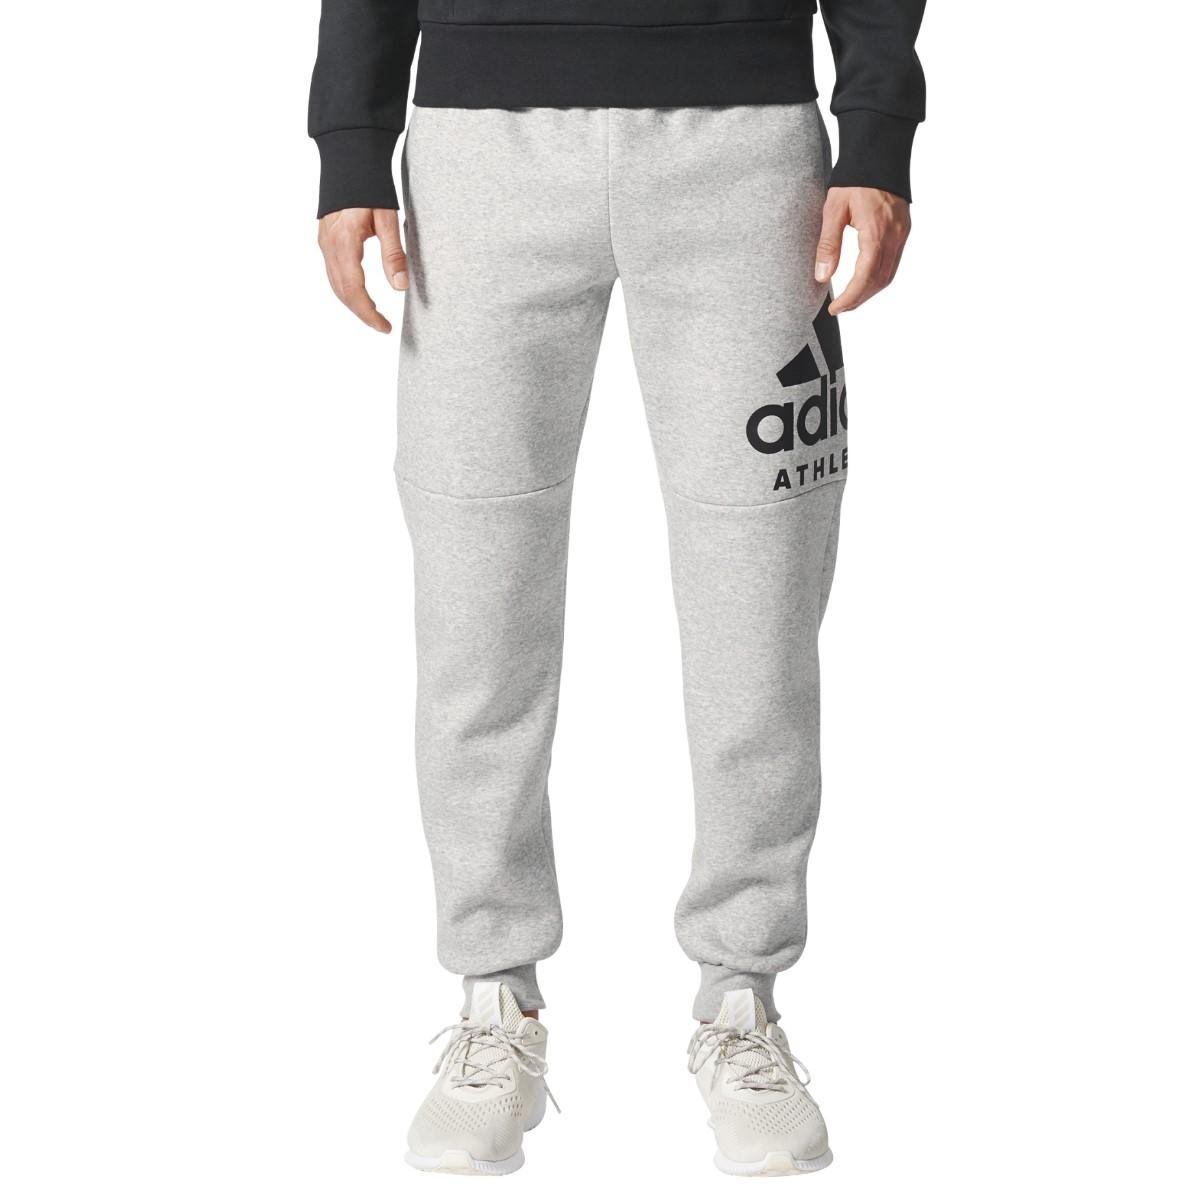 Schwarz Id Pant Fleece Tapered Sport Branded Adidas Sporthose gw5C0qFF